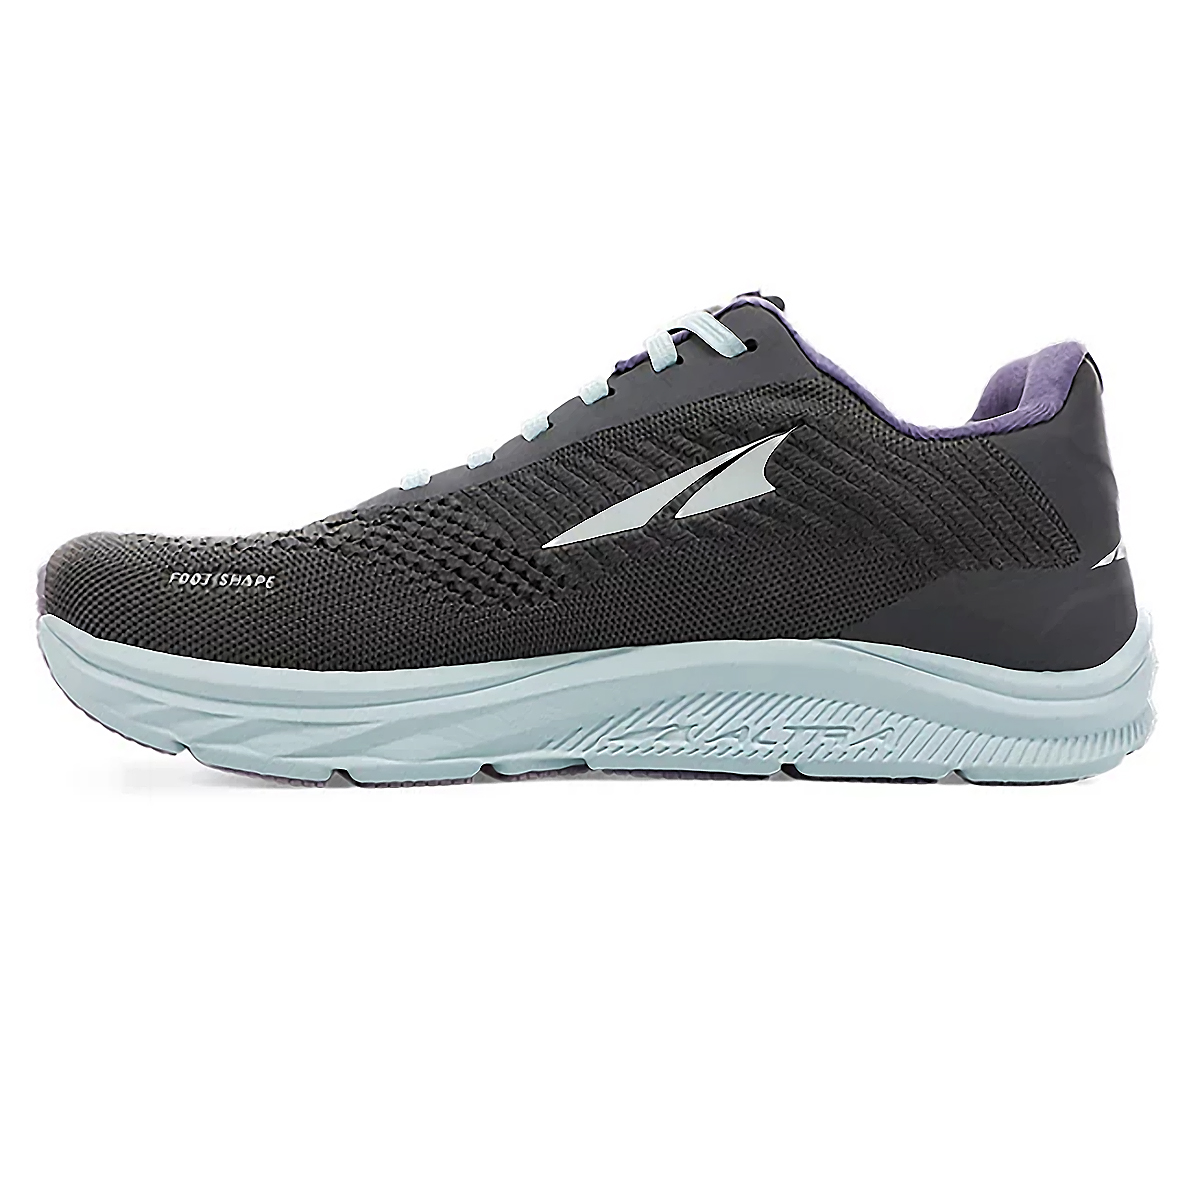 Women's Altra Torin 4.5 Plush Running Shoe - Color: Dark Gray - Size: 5.5 - Width: Regular, Dark Gray, large, image 2